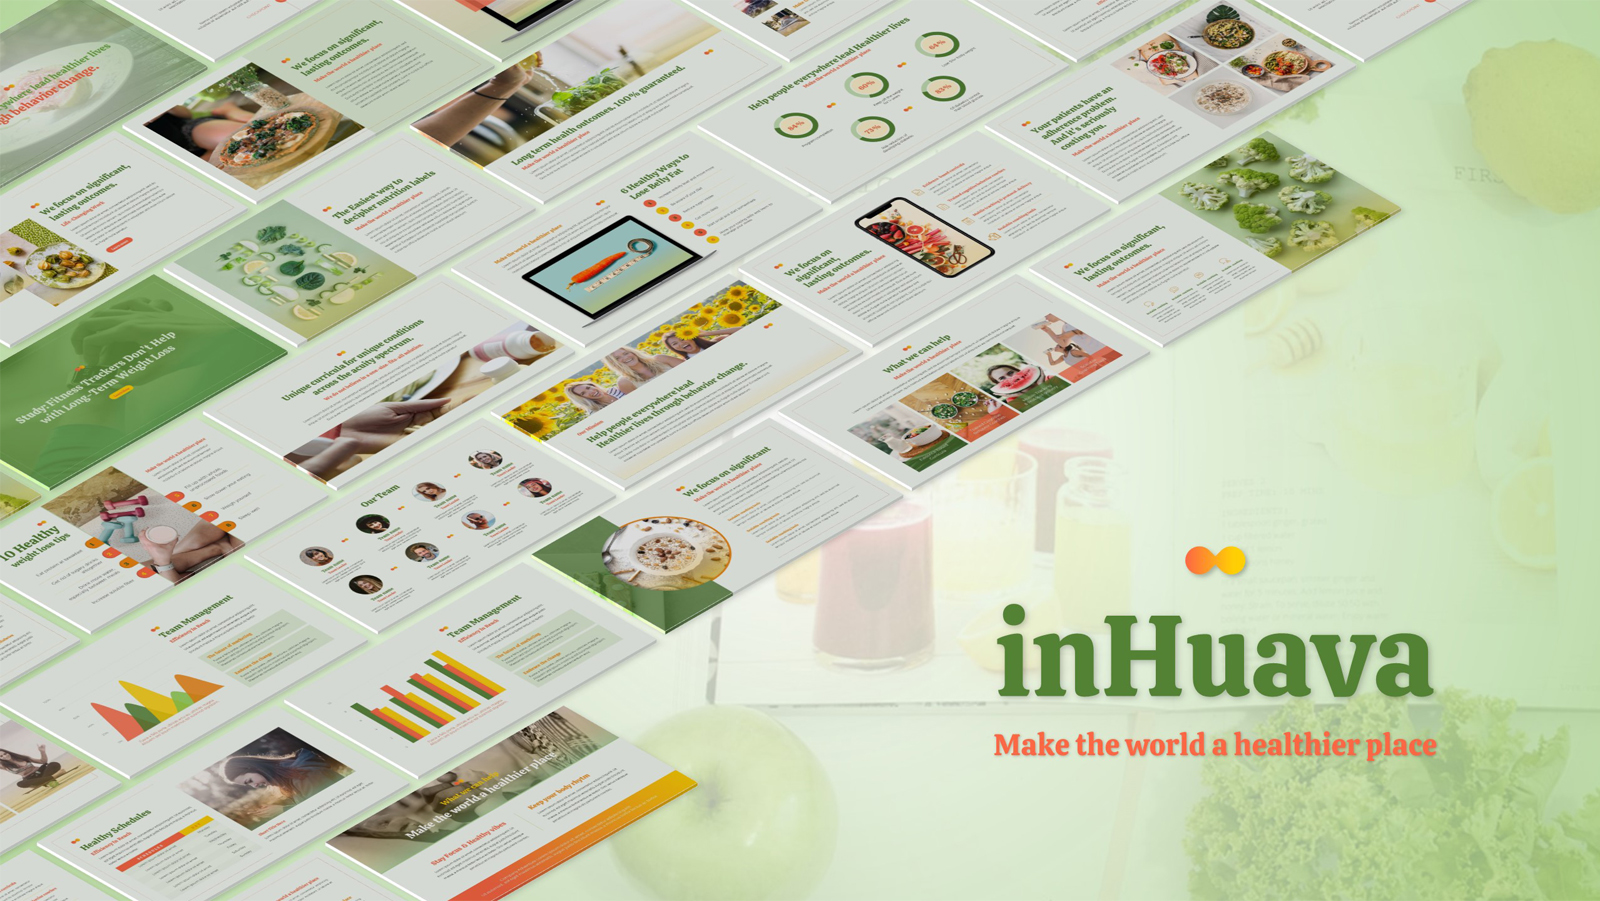 inHuava Powerpoint Template